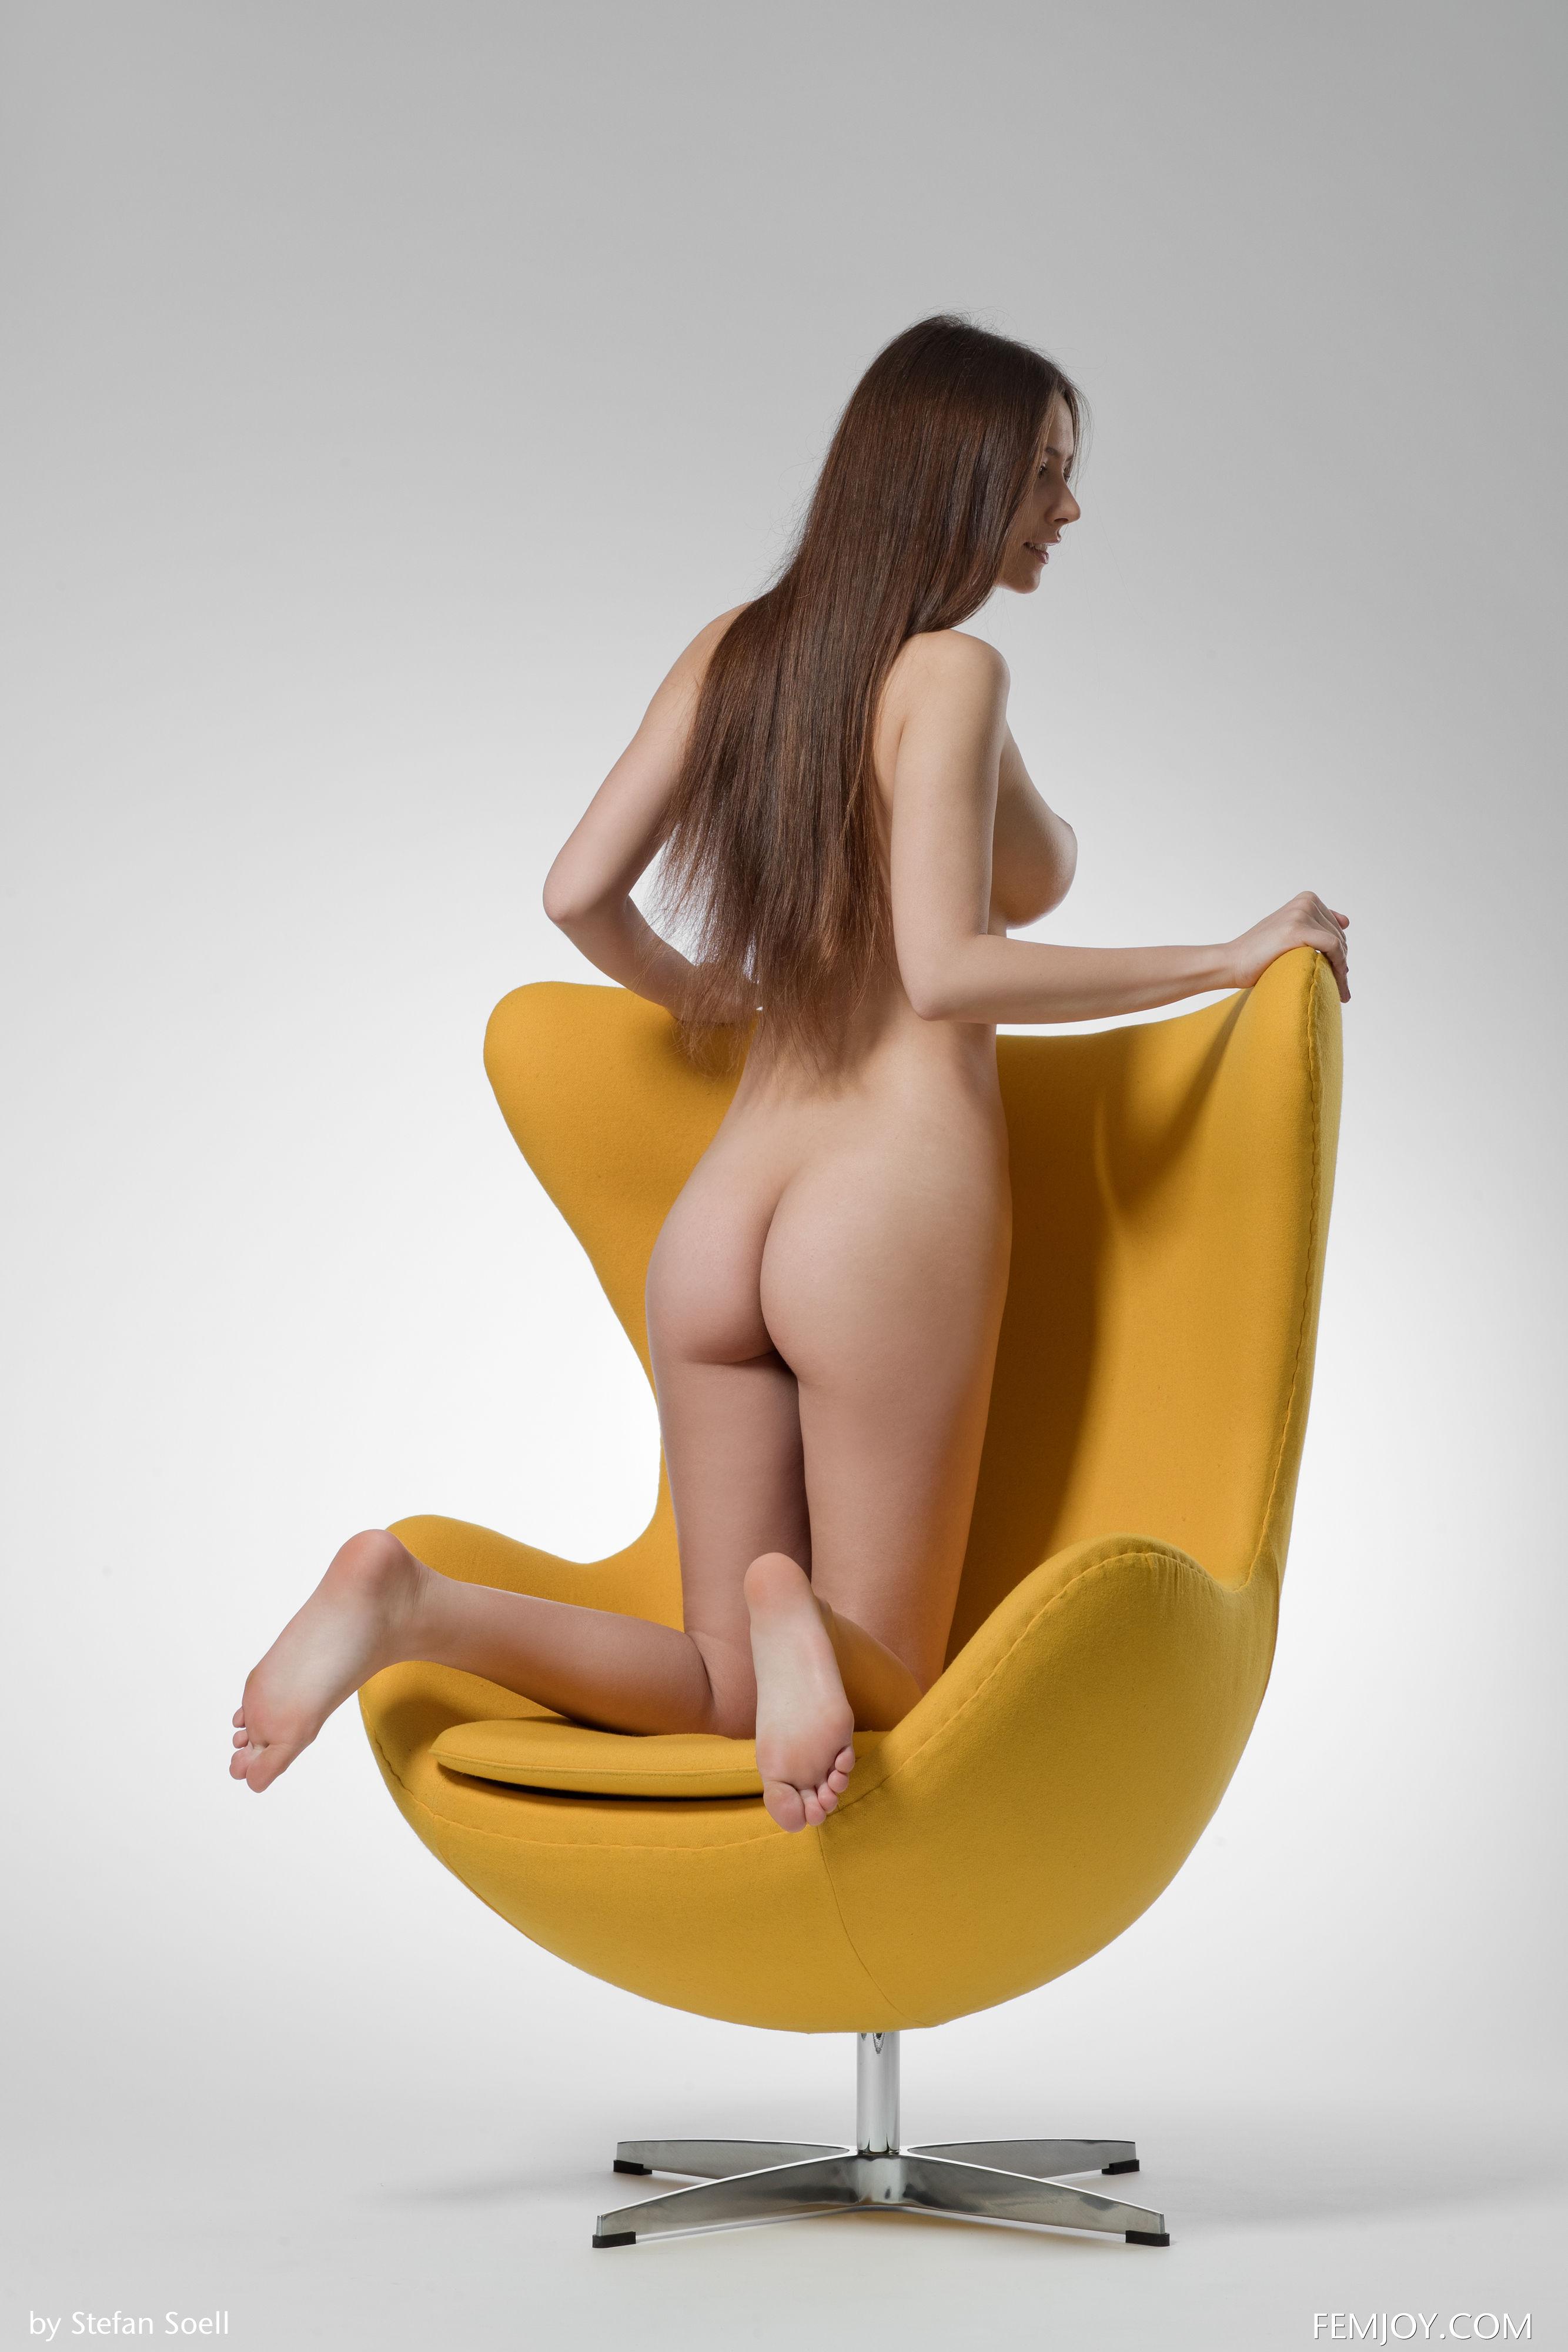 76857683_alisai_femjoy_stefansoell_yellow_19052018p_27.jpg